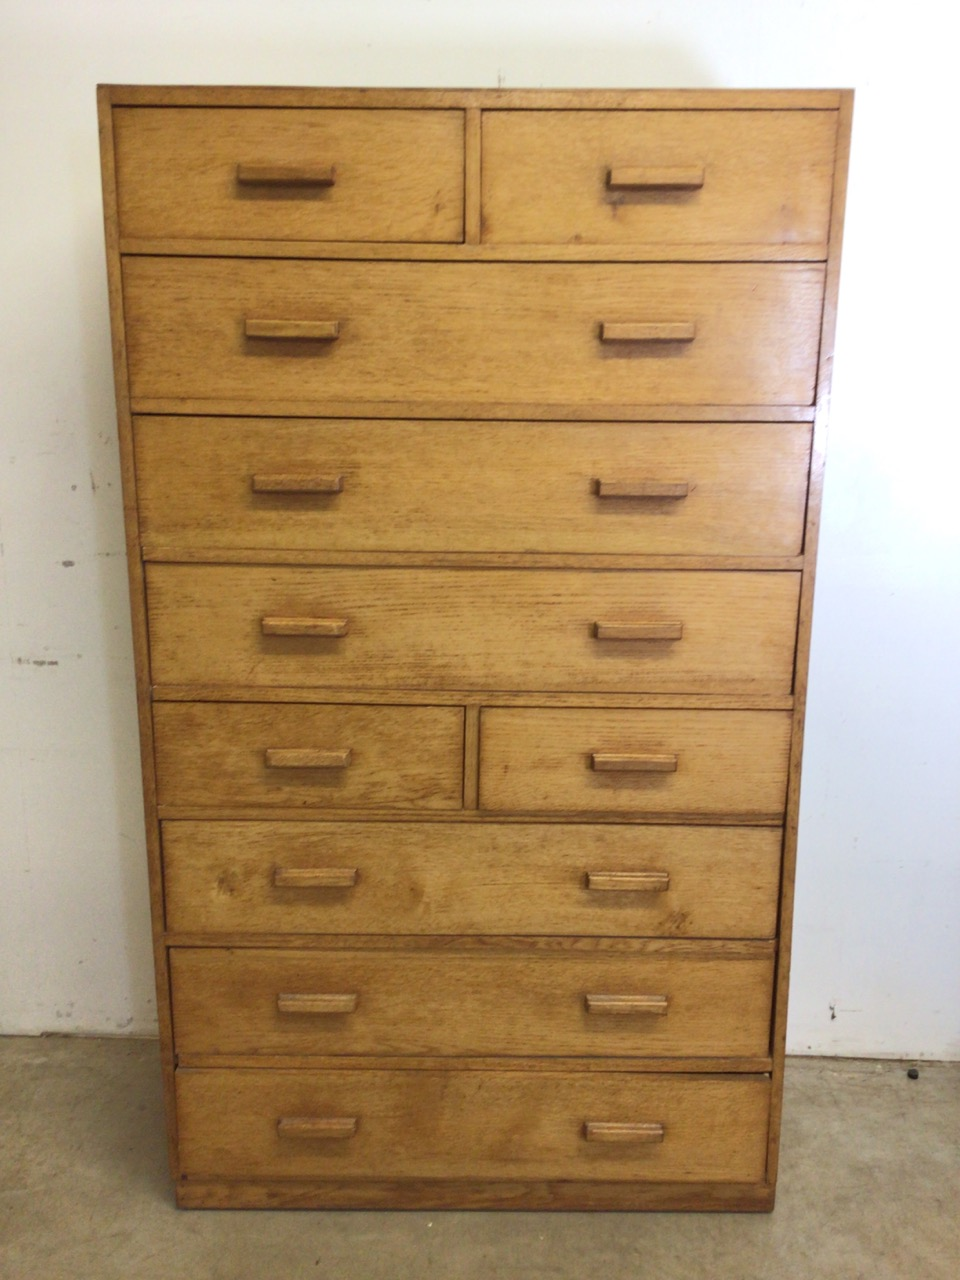 A mid century oak fronted ten drawer tall boy with original handles. W:91cm x D:41cm x H:158cm